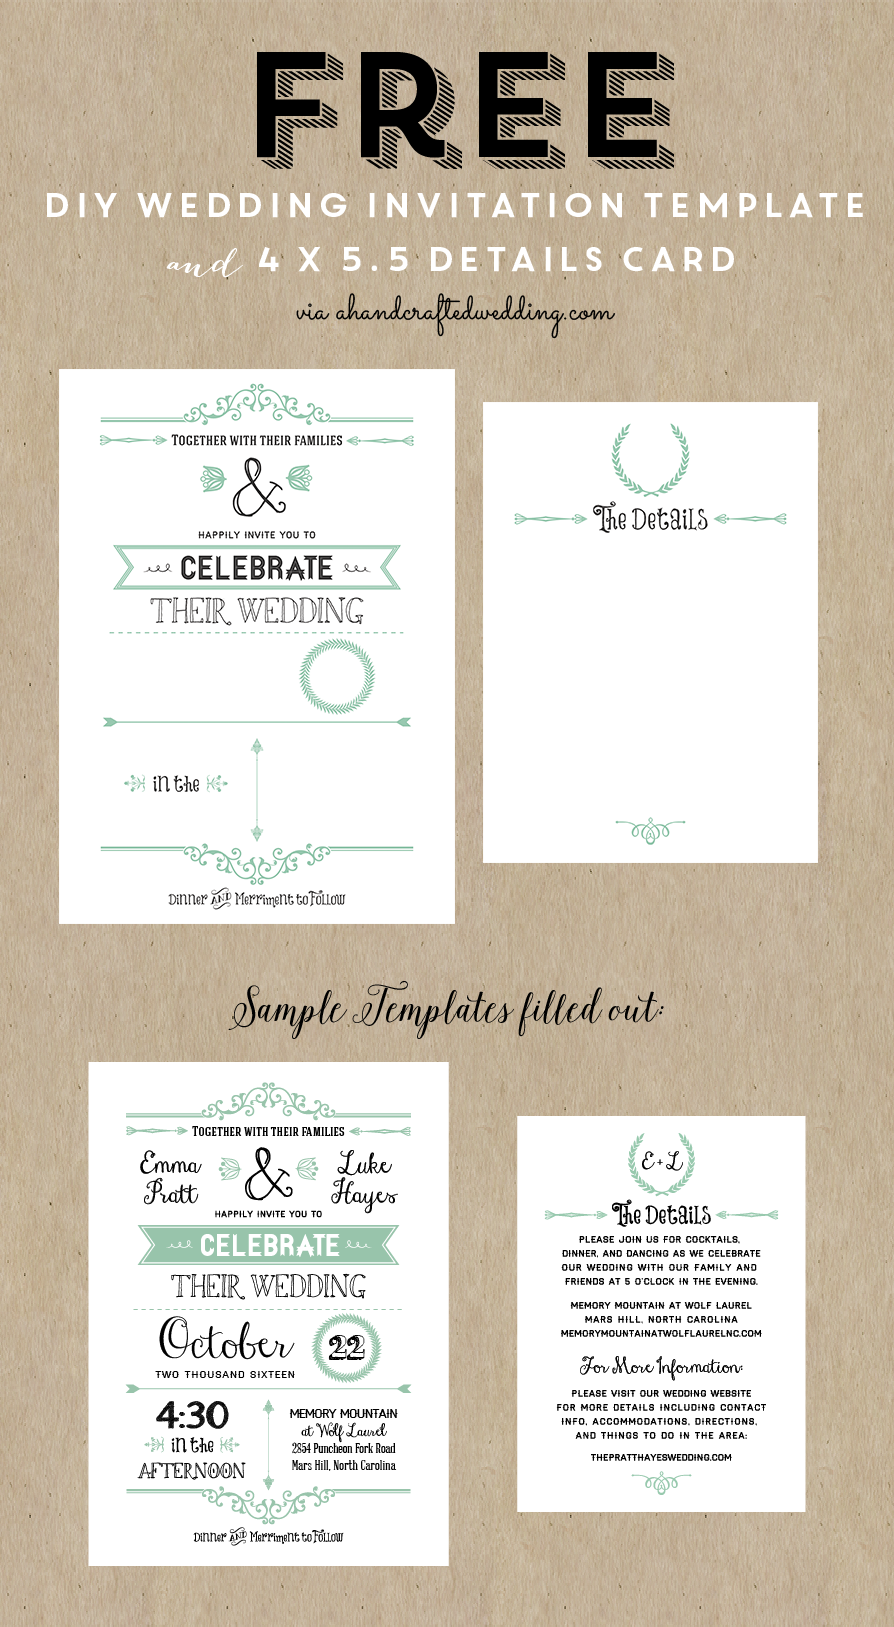 FREE Printable Wedding Invitation Template Free